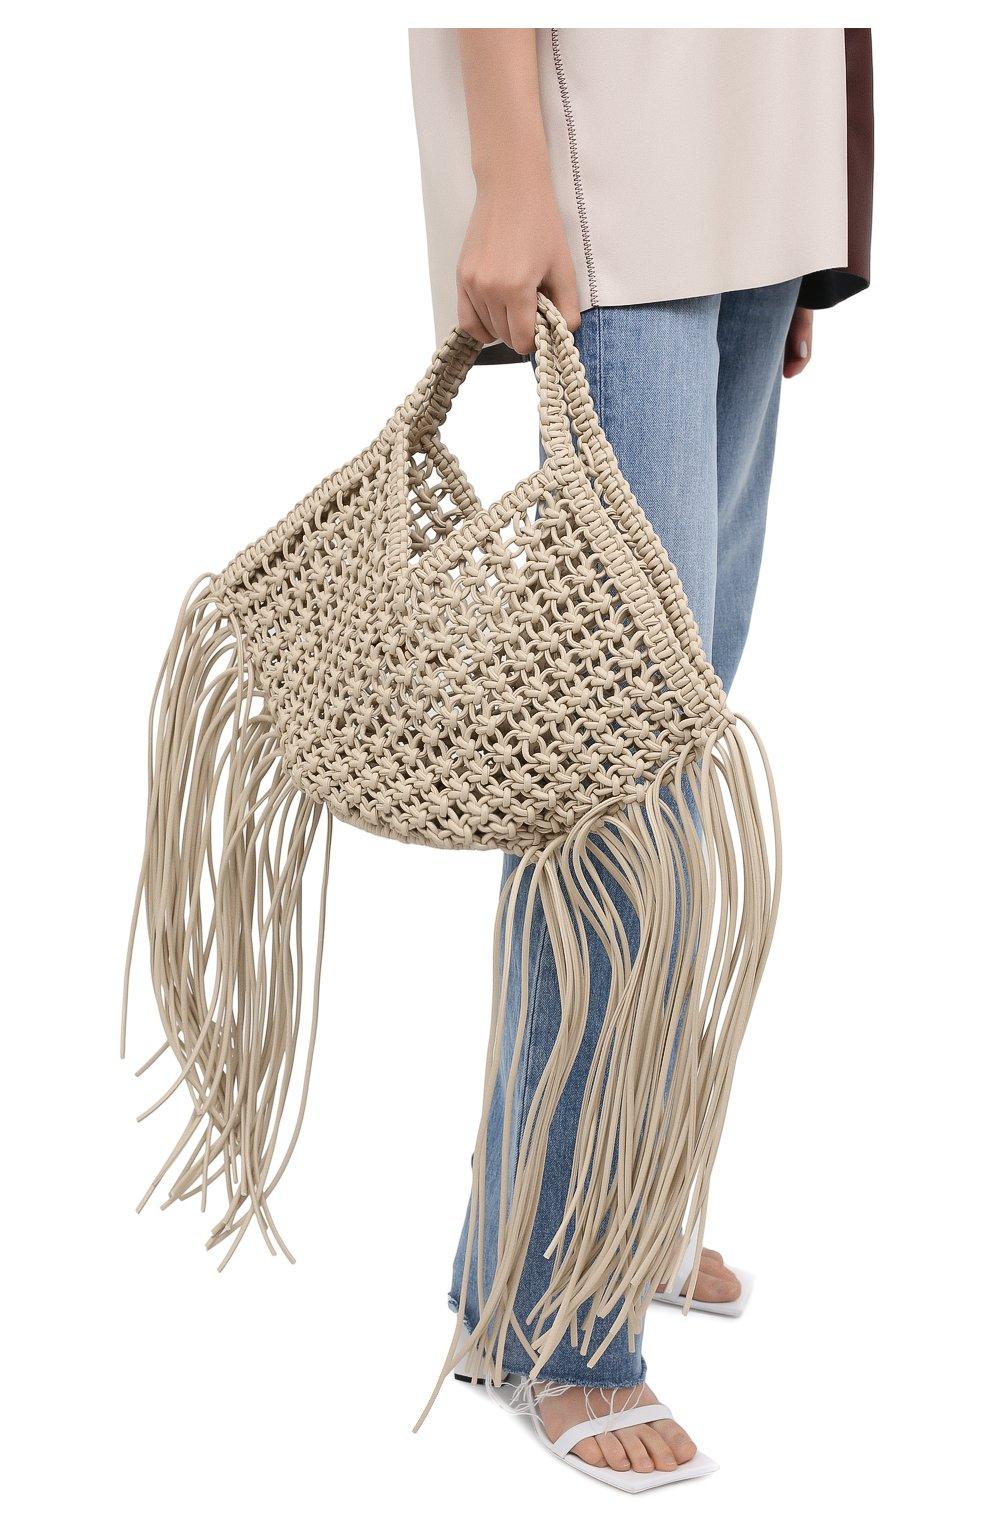 Женский сумка basket YUZEFI светло-бежевого цвета, арт. YUZPF20-SW-01 | Фото 2 (Сумки-технические: Сумки-шопперы; Ошибки технического описания: Нет ширины; Размер: medium; Материал: Текстиль)